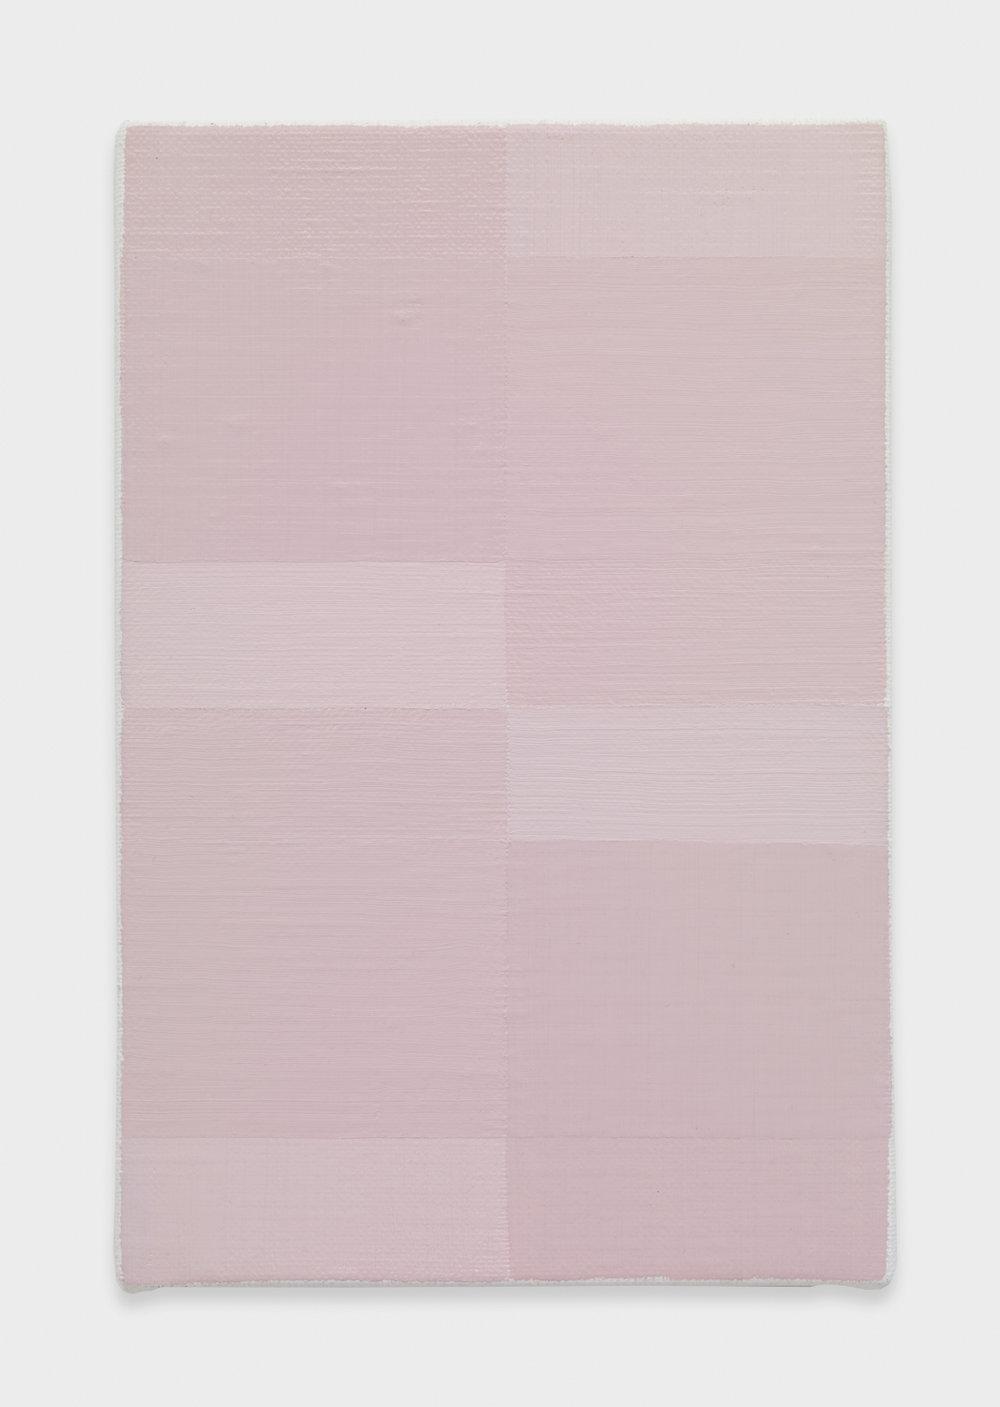 Yui Yaegashi Wipe 2017 Oil on canvas 9 5/8h x 6 1/3w in 24.45h x 16.09w cm YY095